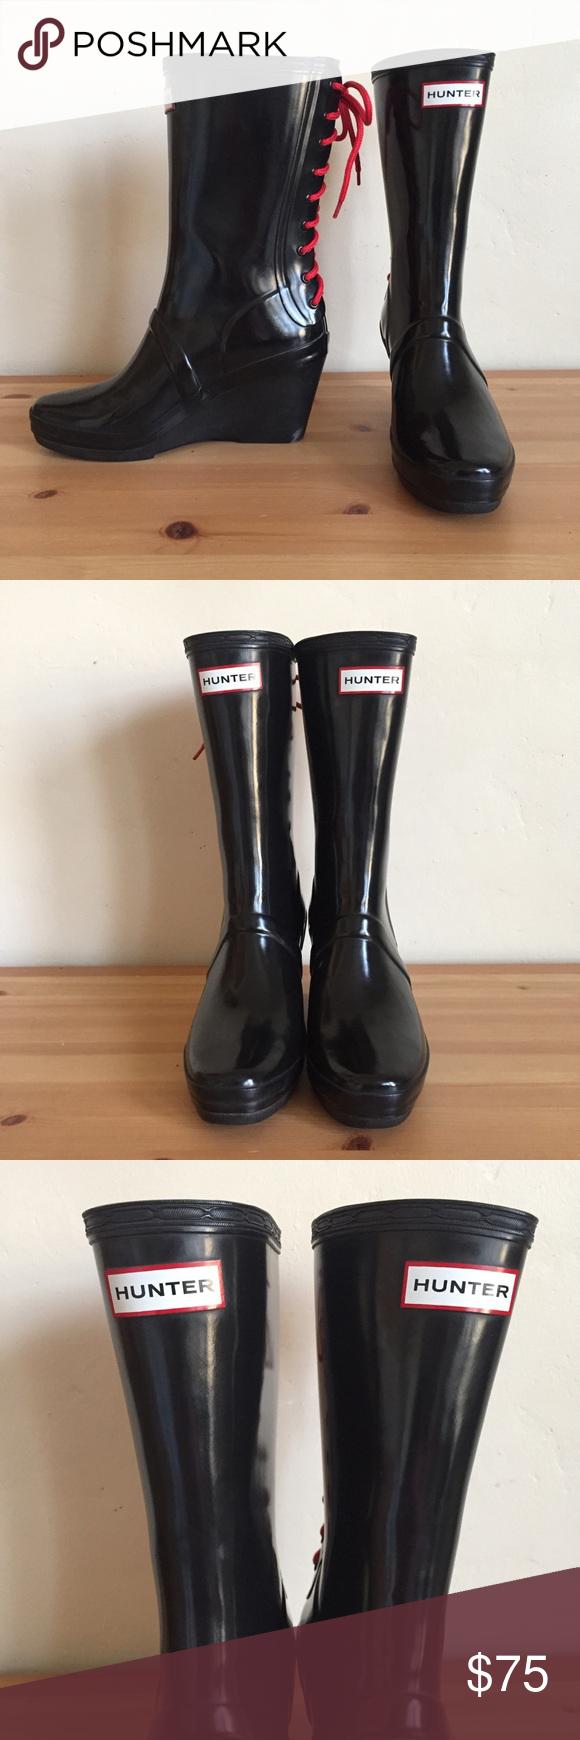 c9140bd62248 Mint❣️Hunter Verbier Wedge Rain Boots Black Red